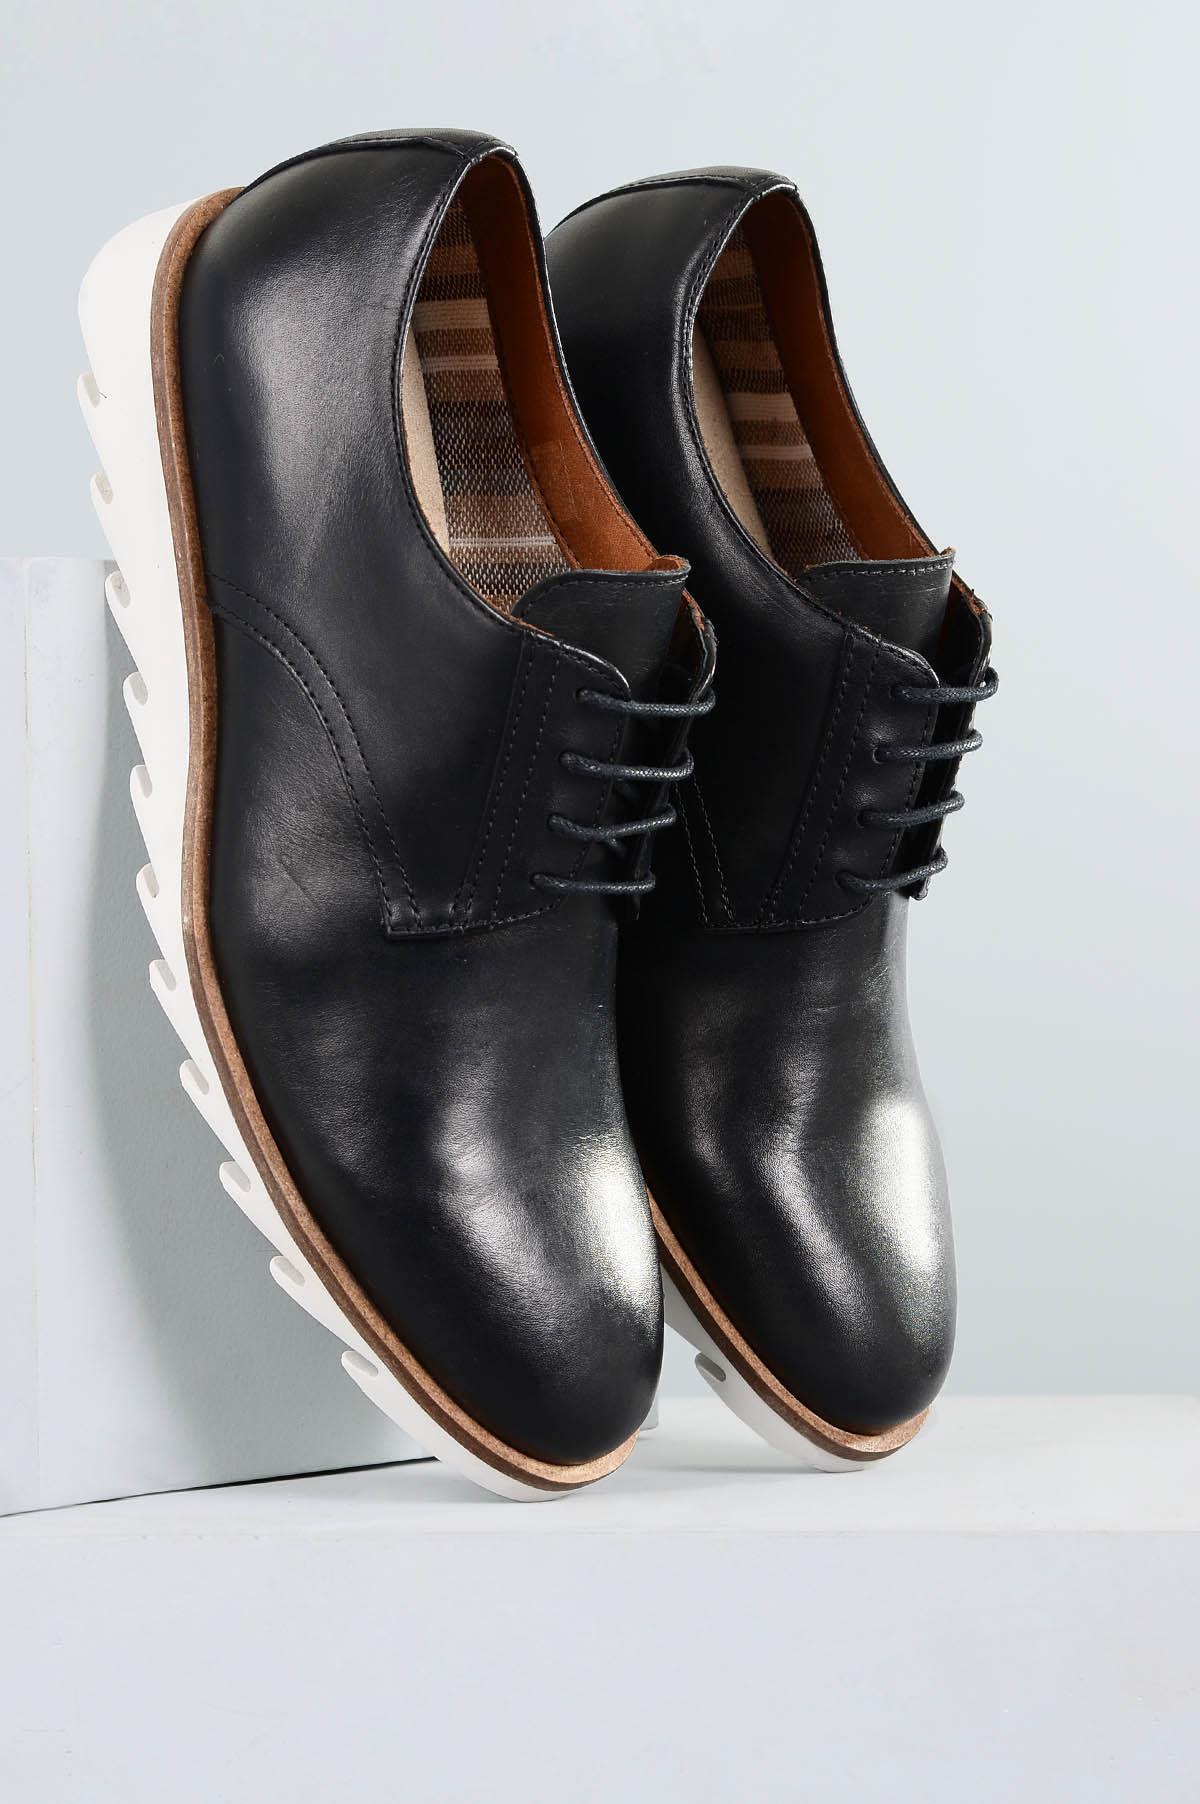 a2dbdfdac Sapato Masculino Moisés Mundial CR-PRETO - Mundial Calçados